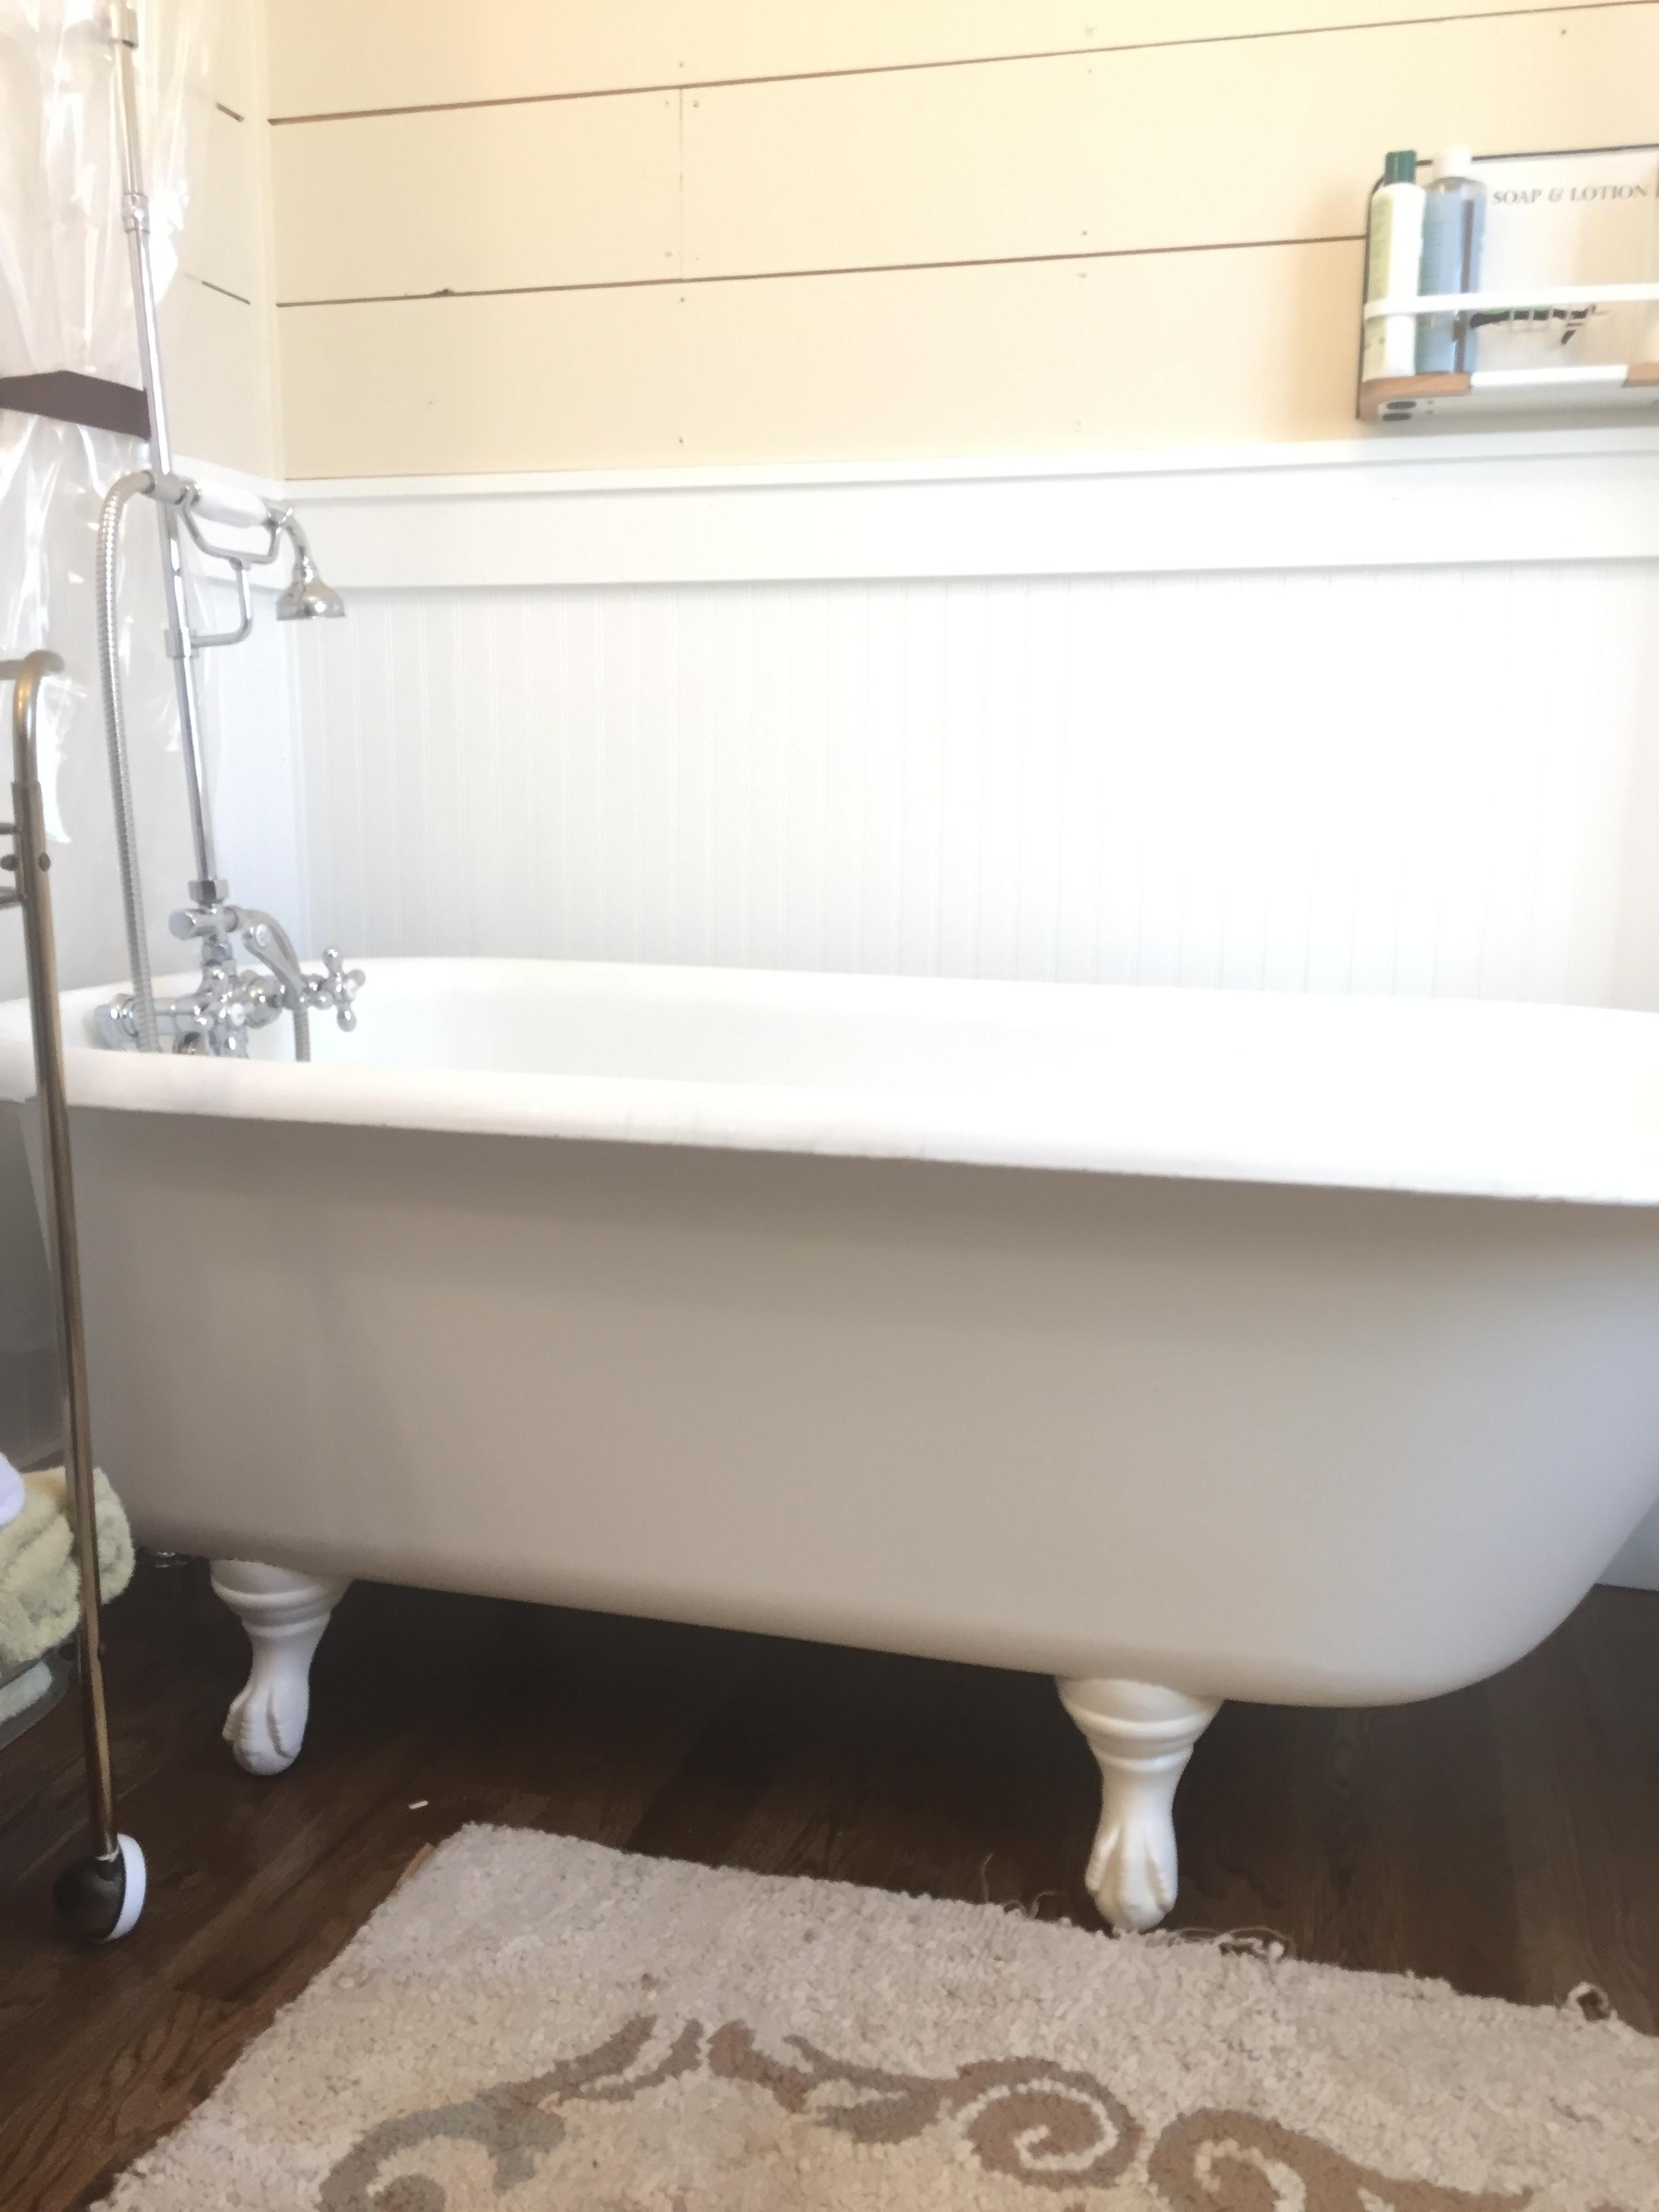 clawfoot tub side view